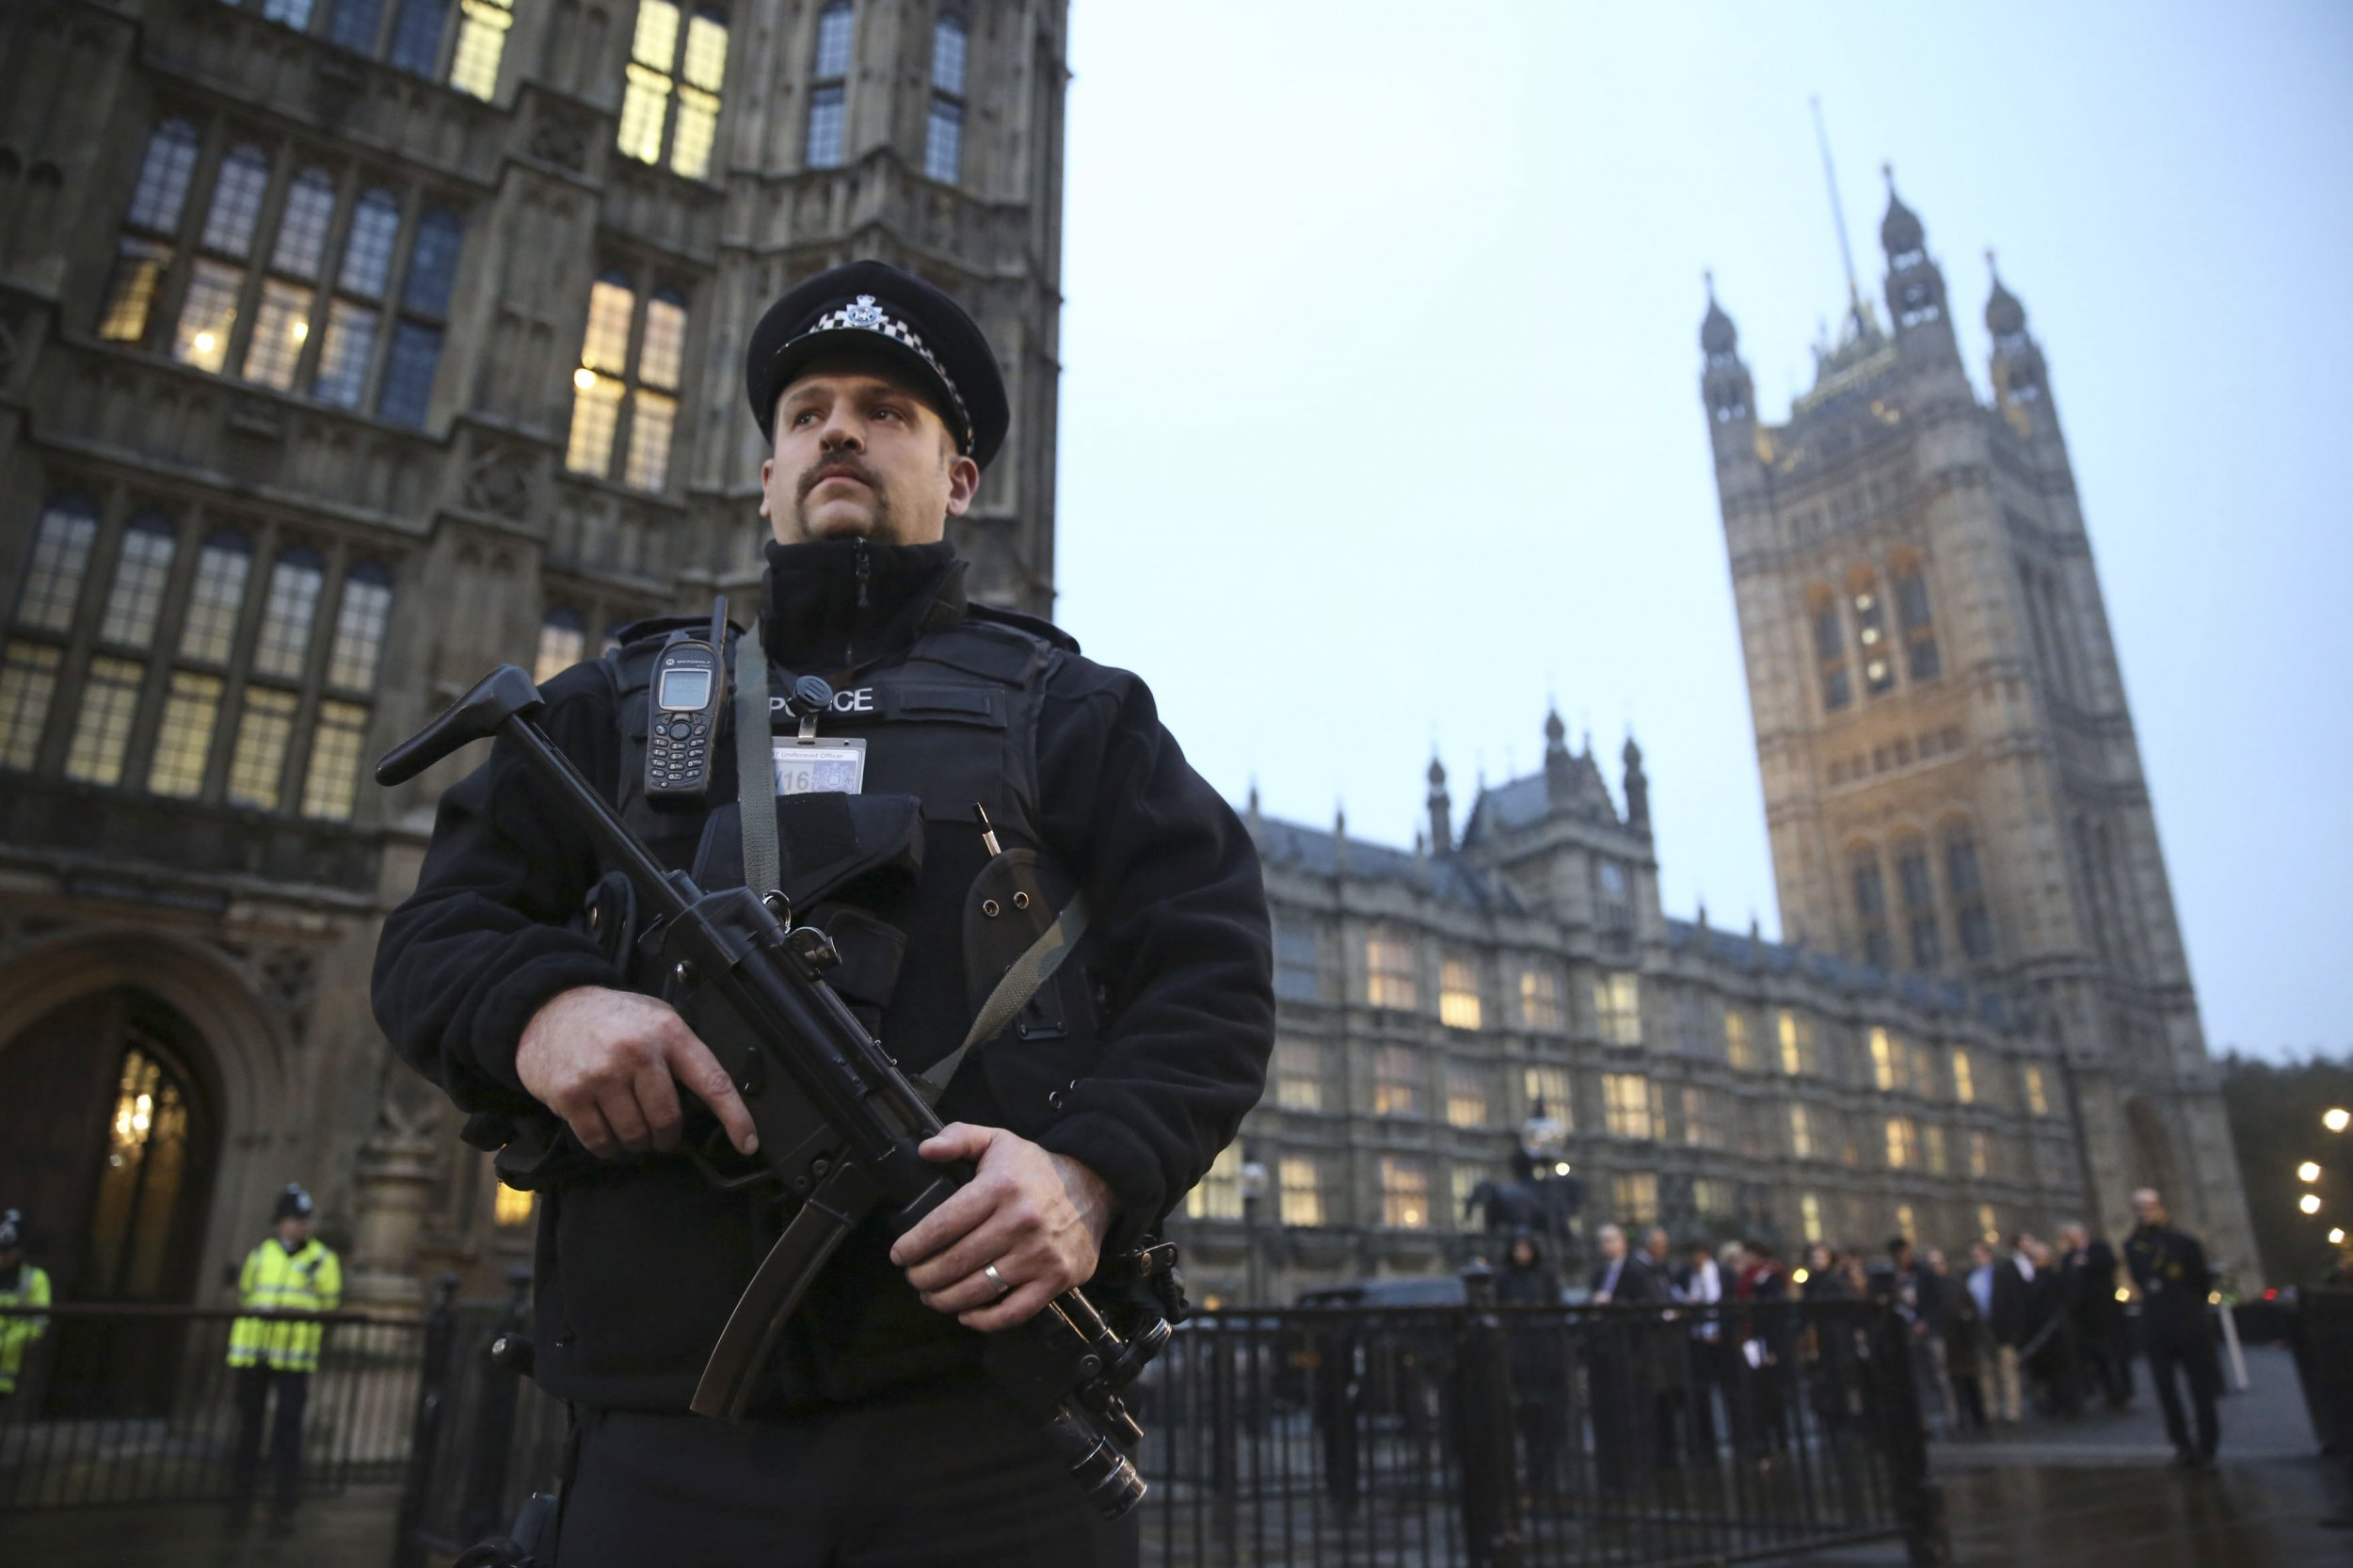 London Security